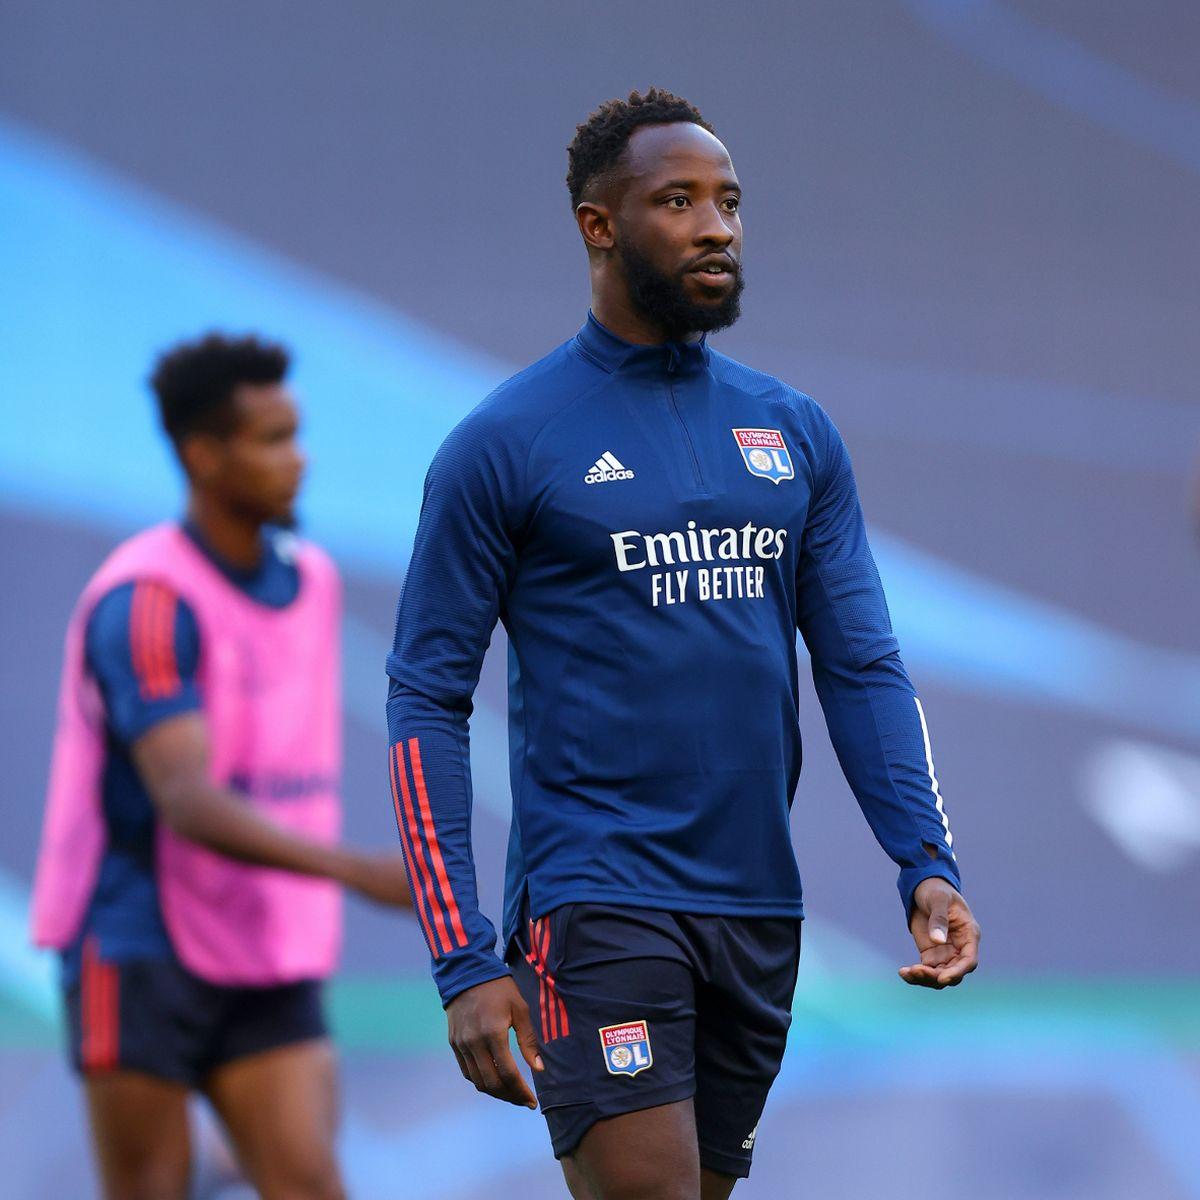 Tiền đạo Moussa Dembele của Lyon bị gãy tay trong buổi tập